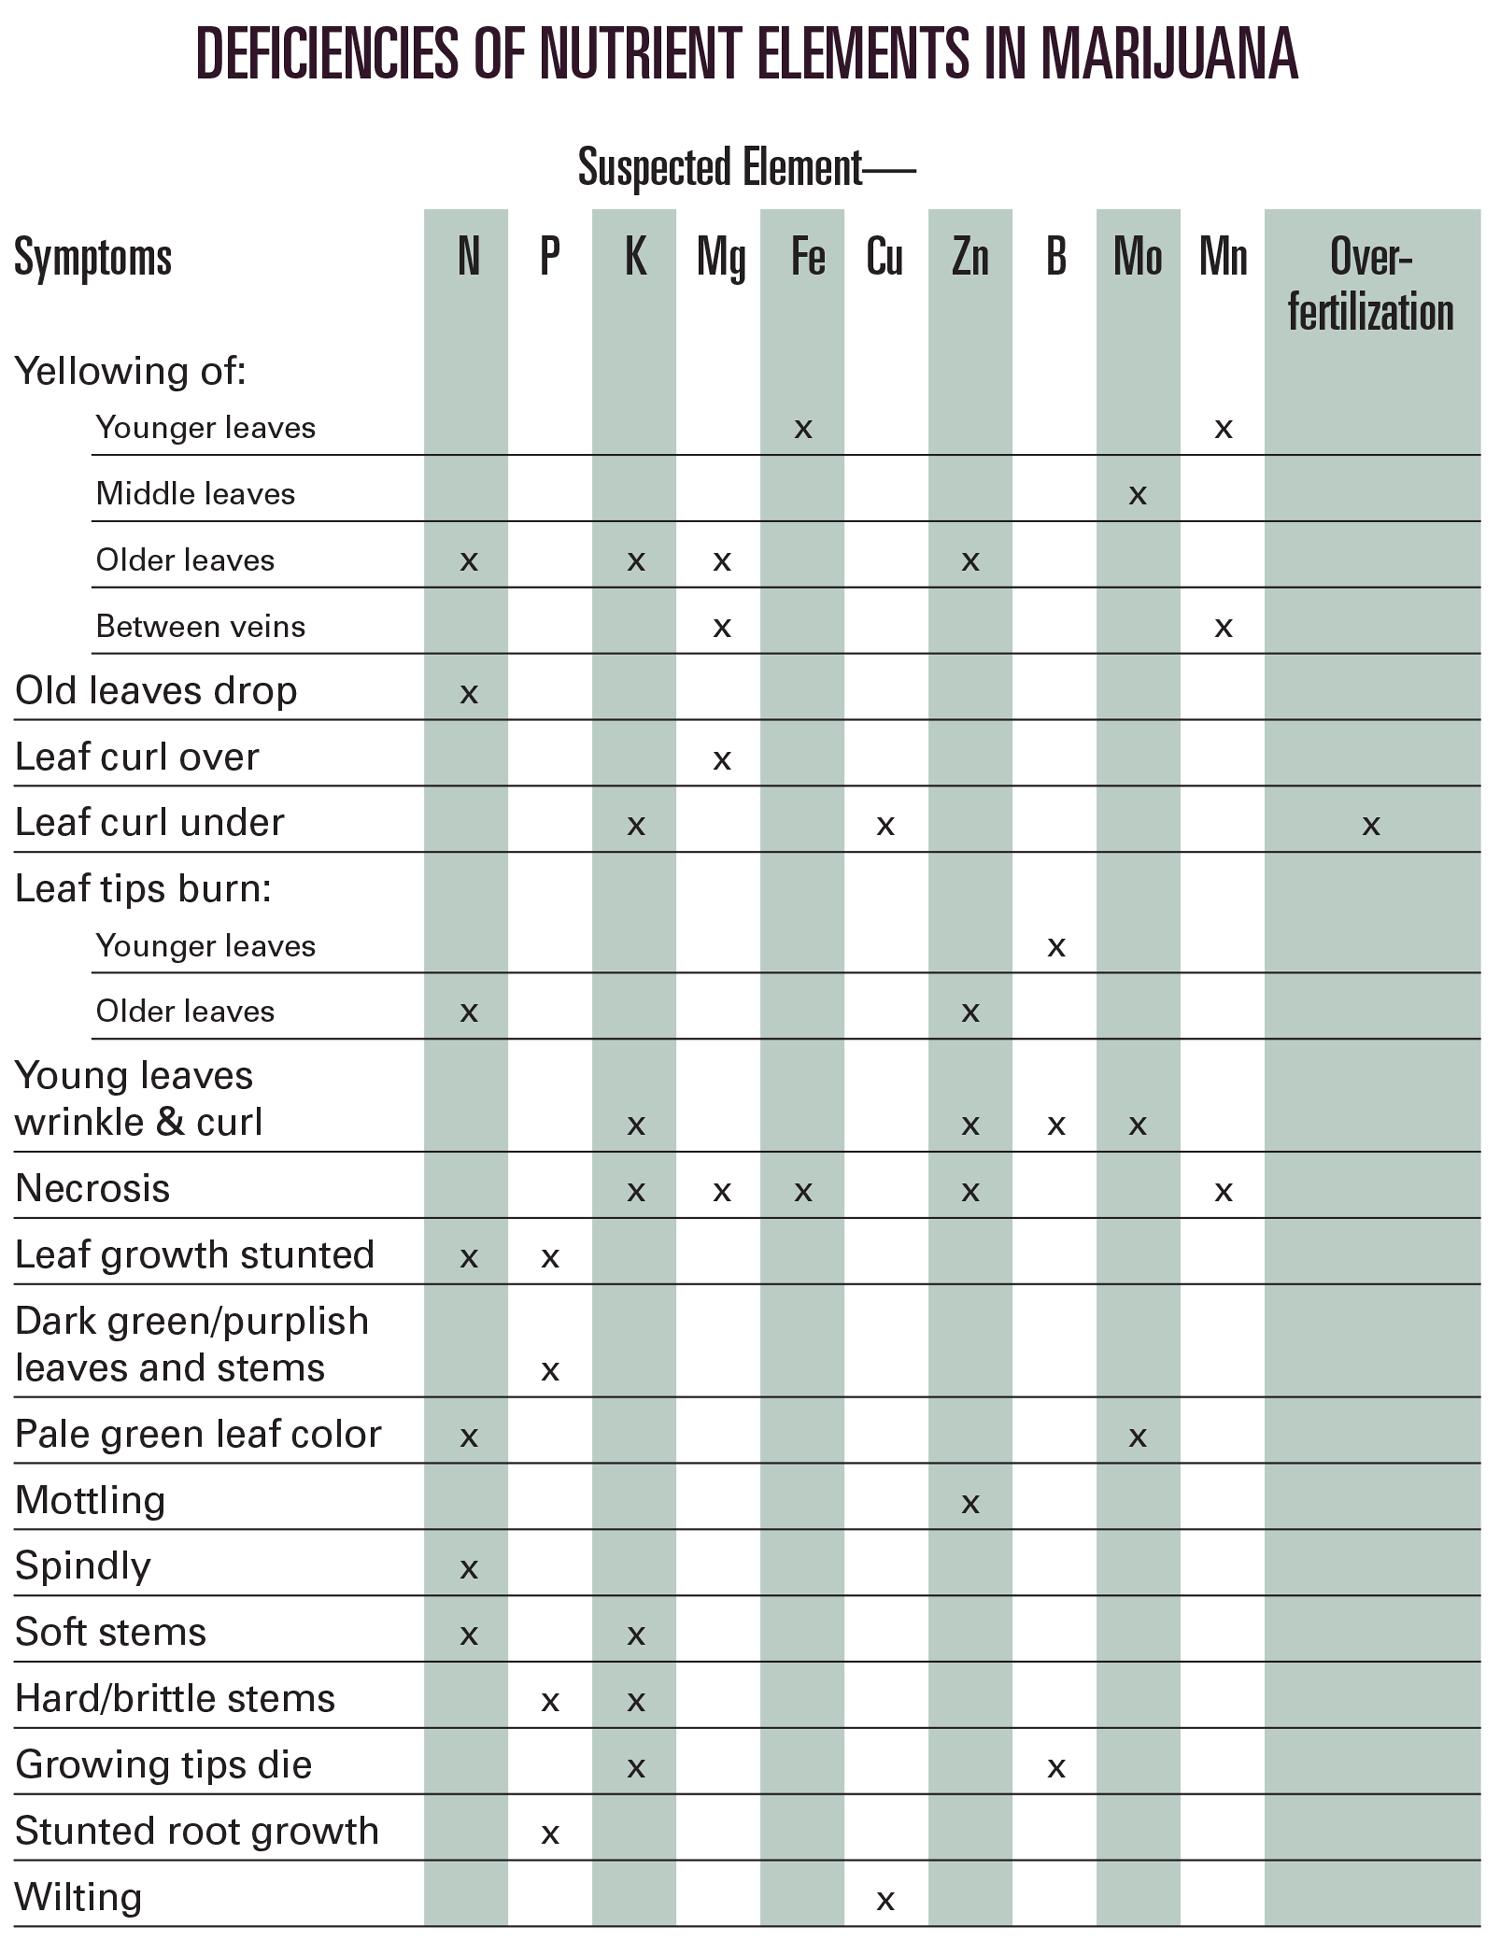 Ed_Rosenthal_Nutrients_chart.jpg